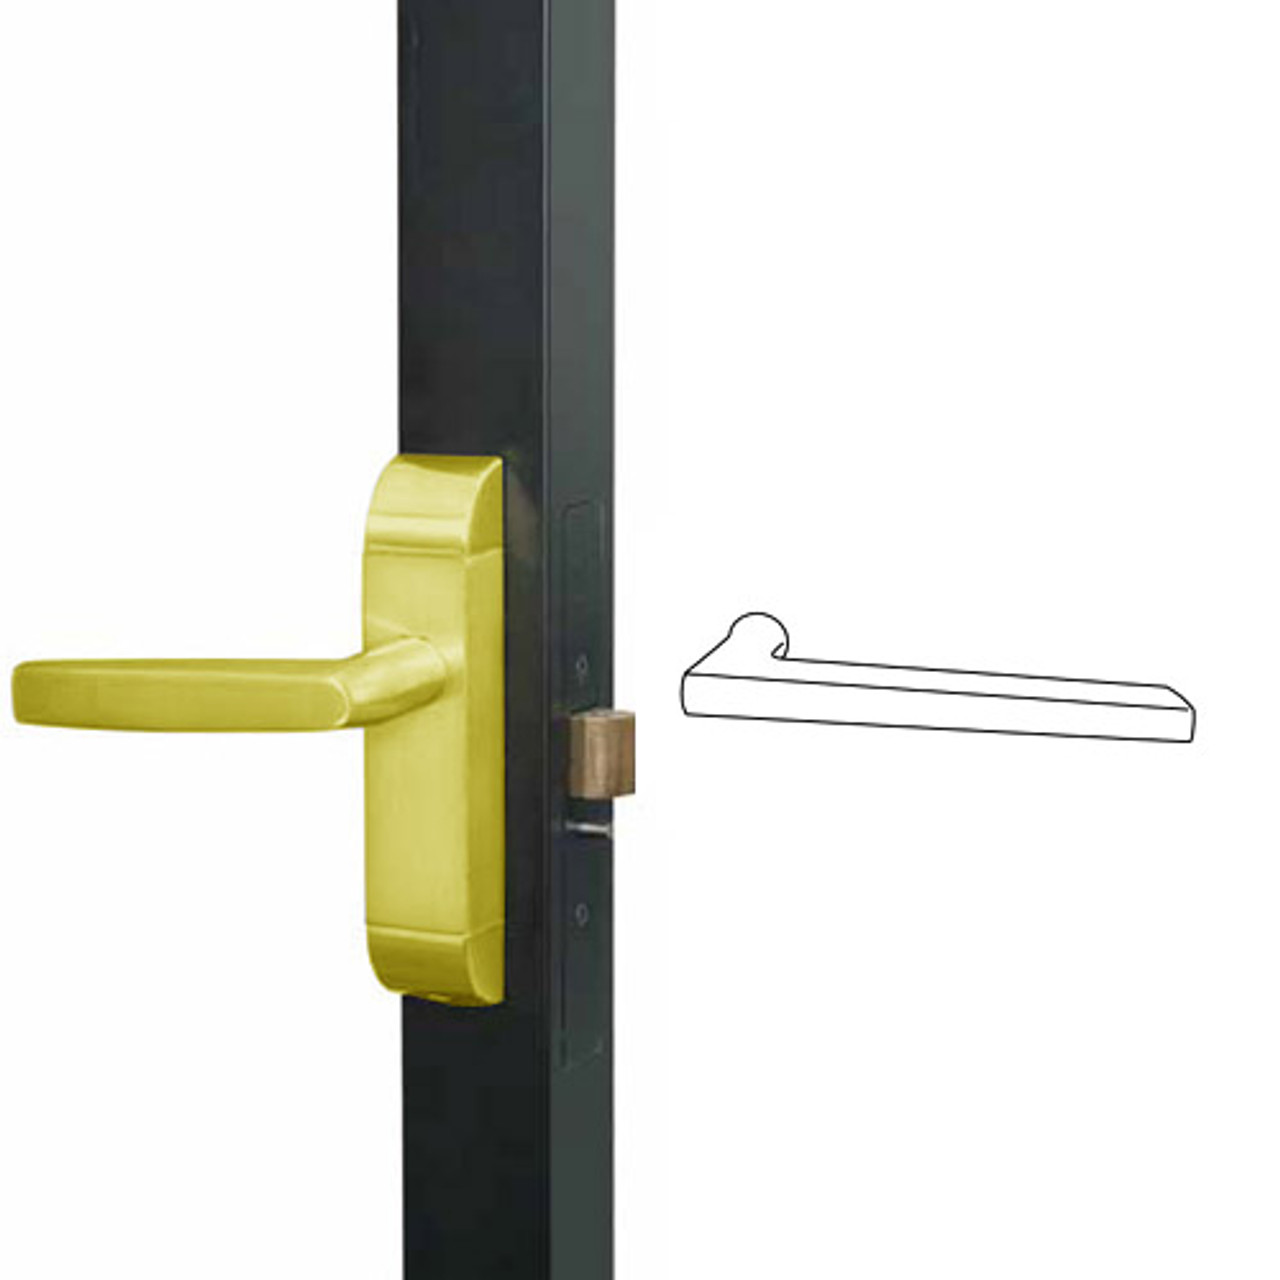 4600-MD-651-US3 Adams Rite MD Designer Deadlatch handle in Bright Brass Finish